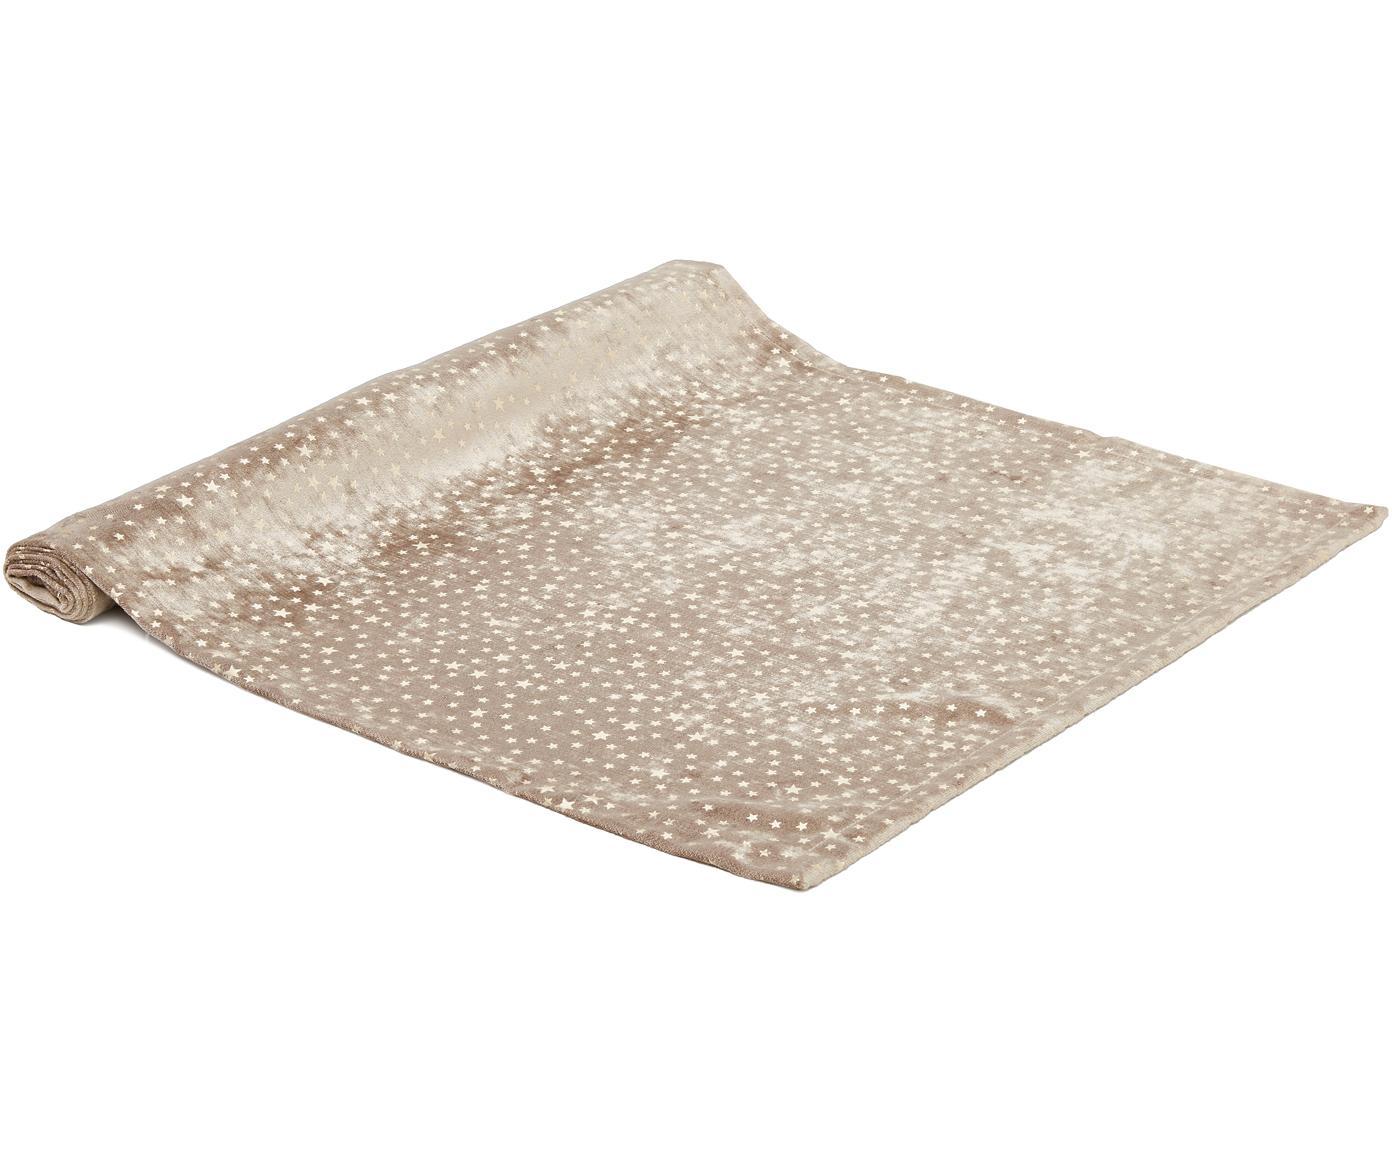 Fluwelen tafelloper Estrella, Polyester fluweel, Beige, goudkleurig, 50 x 140 cm